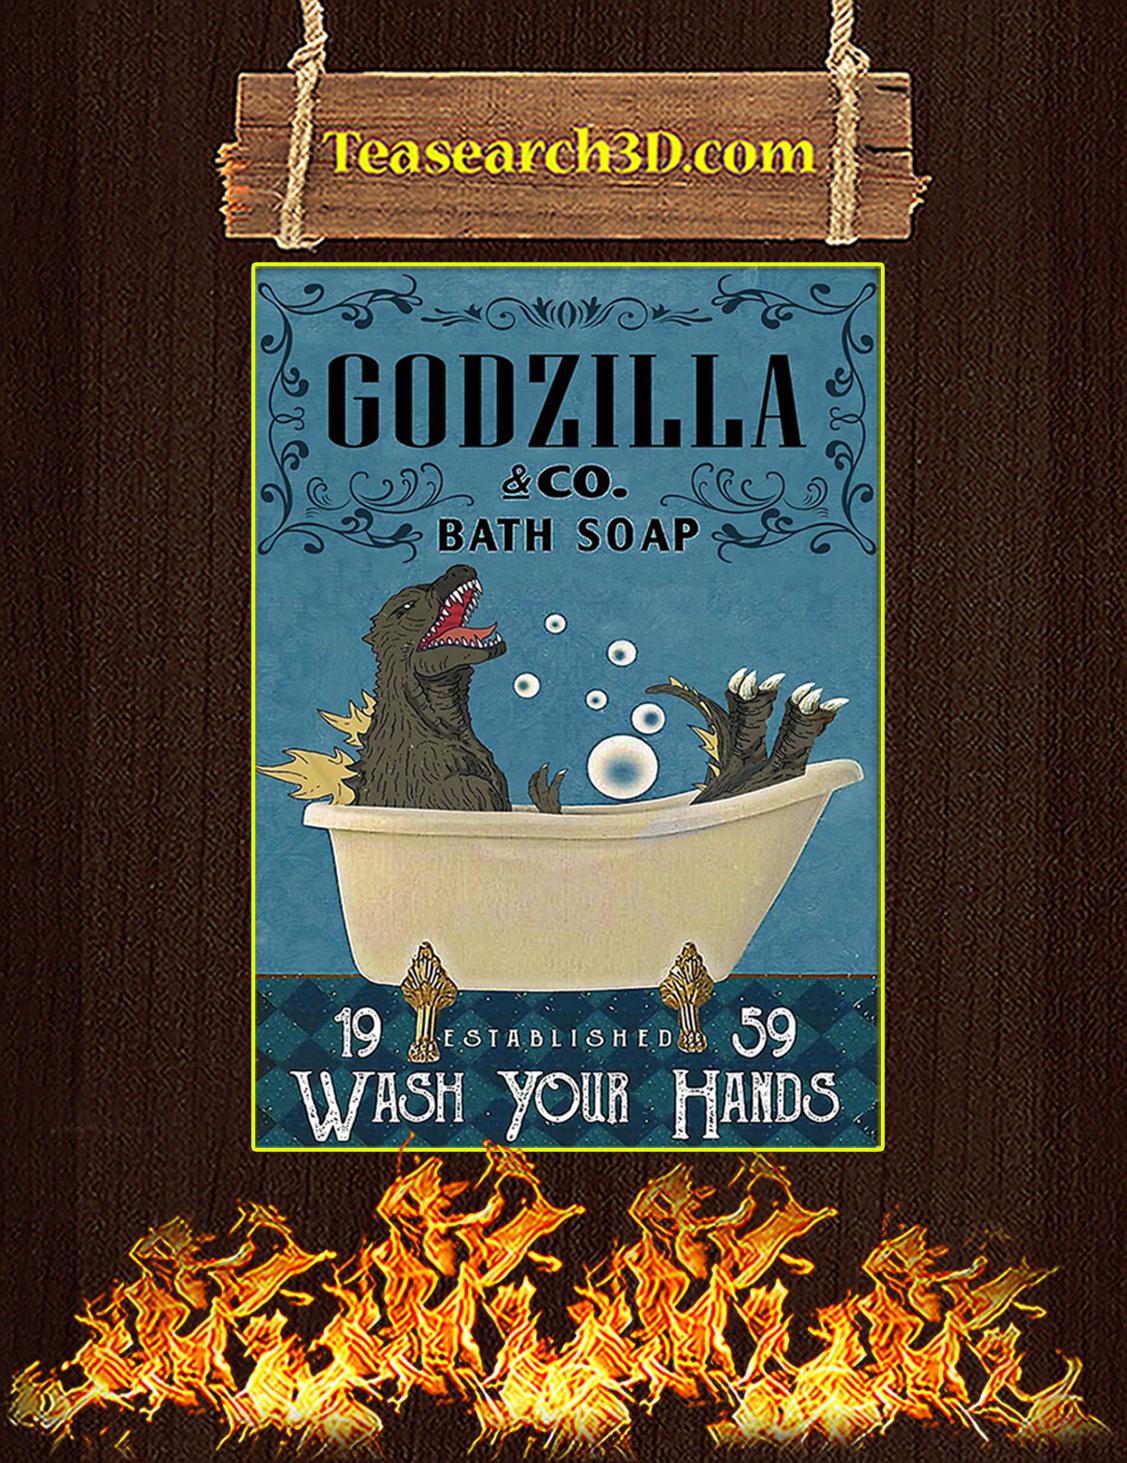 Godzilla co bath soap wash your hands poster A3